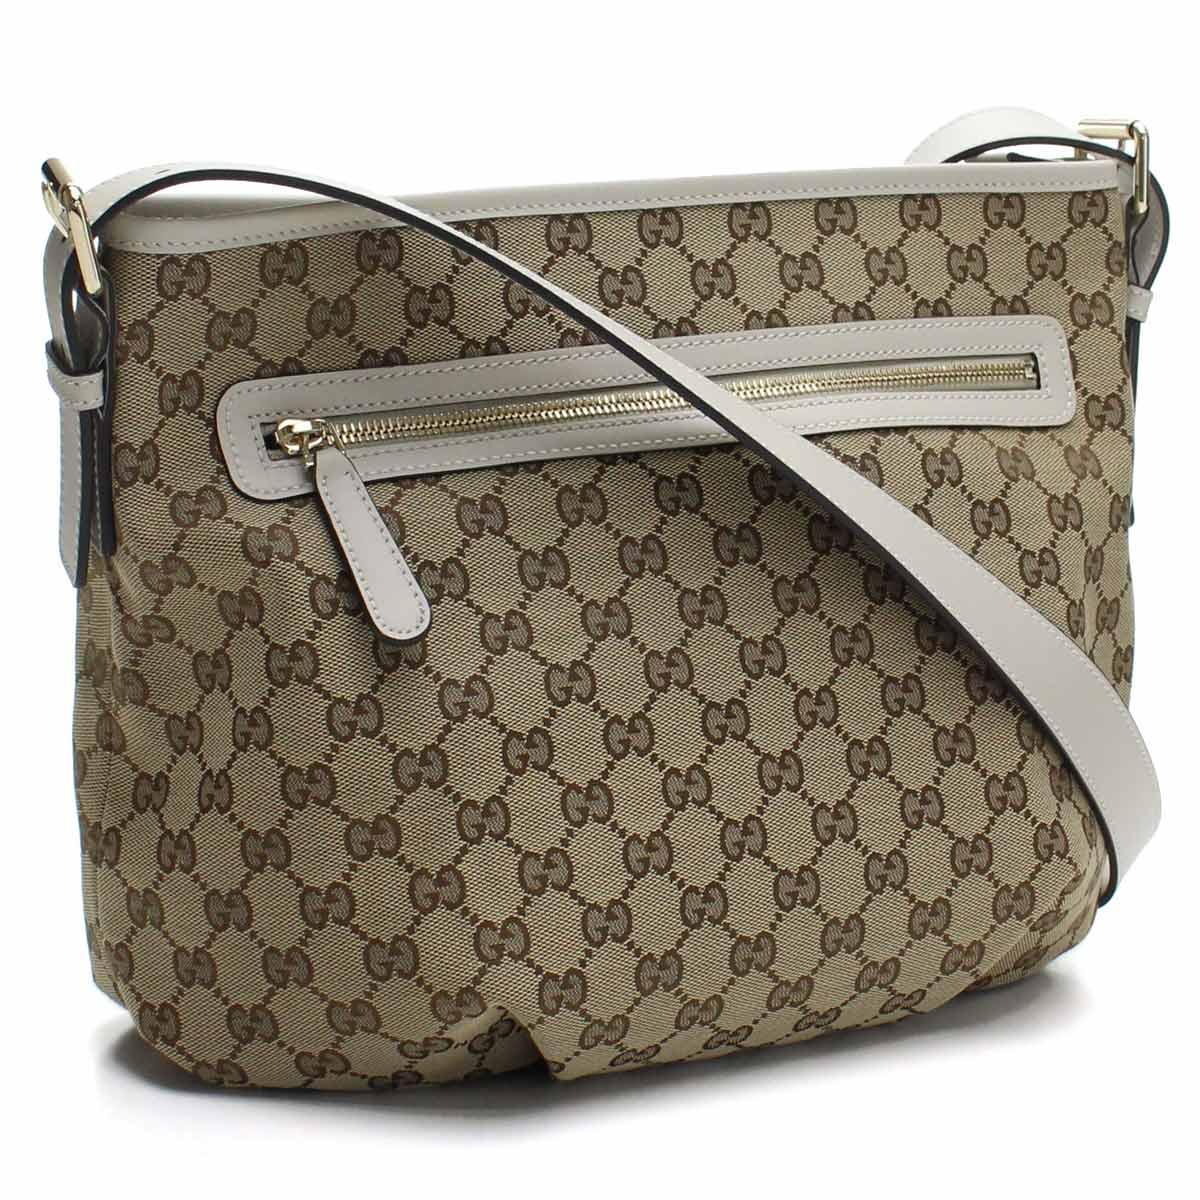 a8c4f215090b Bighit The total brand wholesale: Take Gucci GUCCI GG canvas slant; shoulder  bag 388930 KQWFY 9761 beige system | Rakuten Global Market